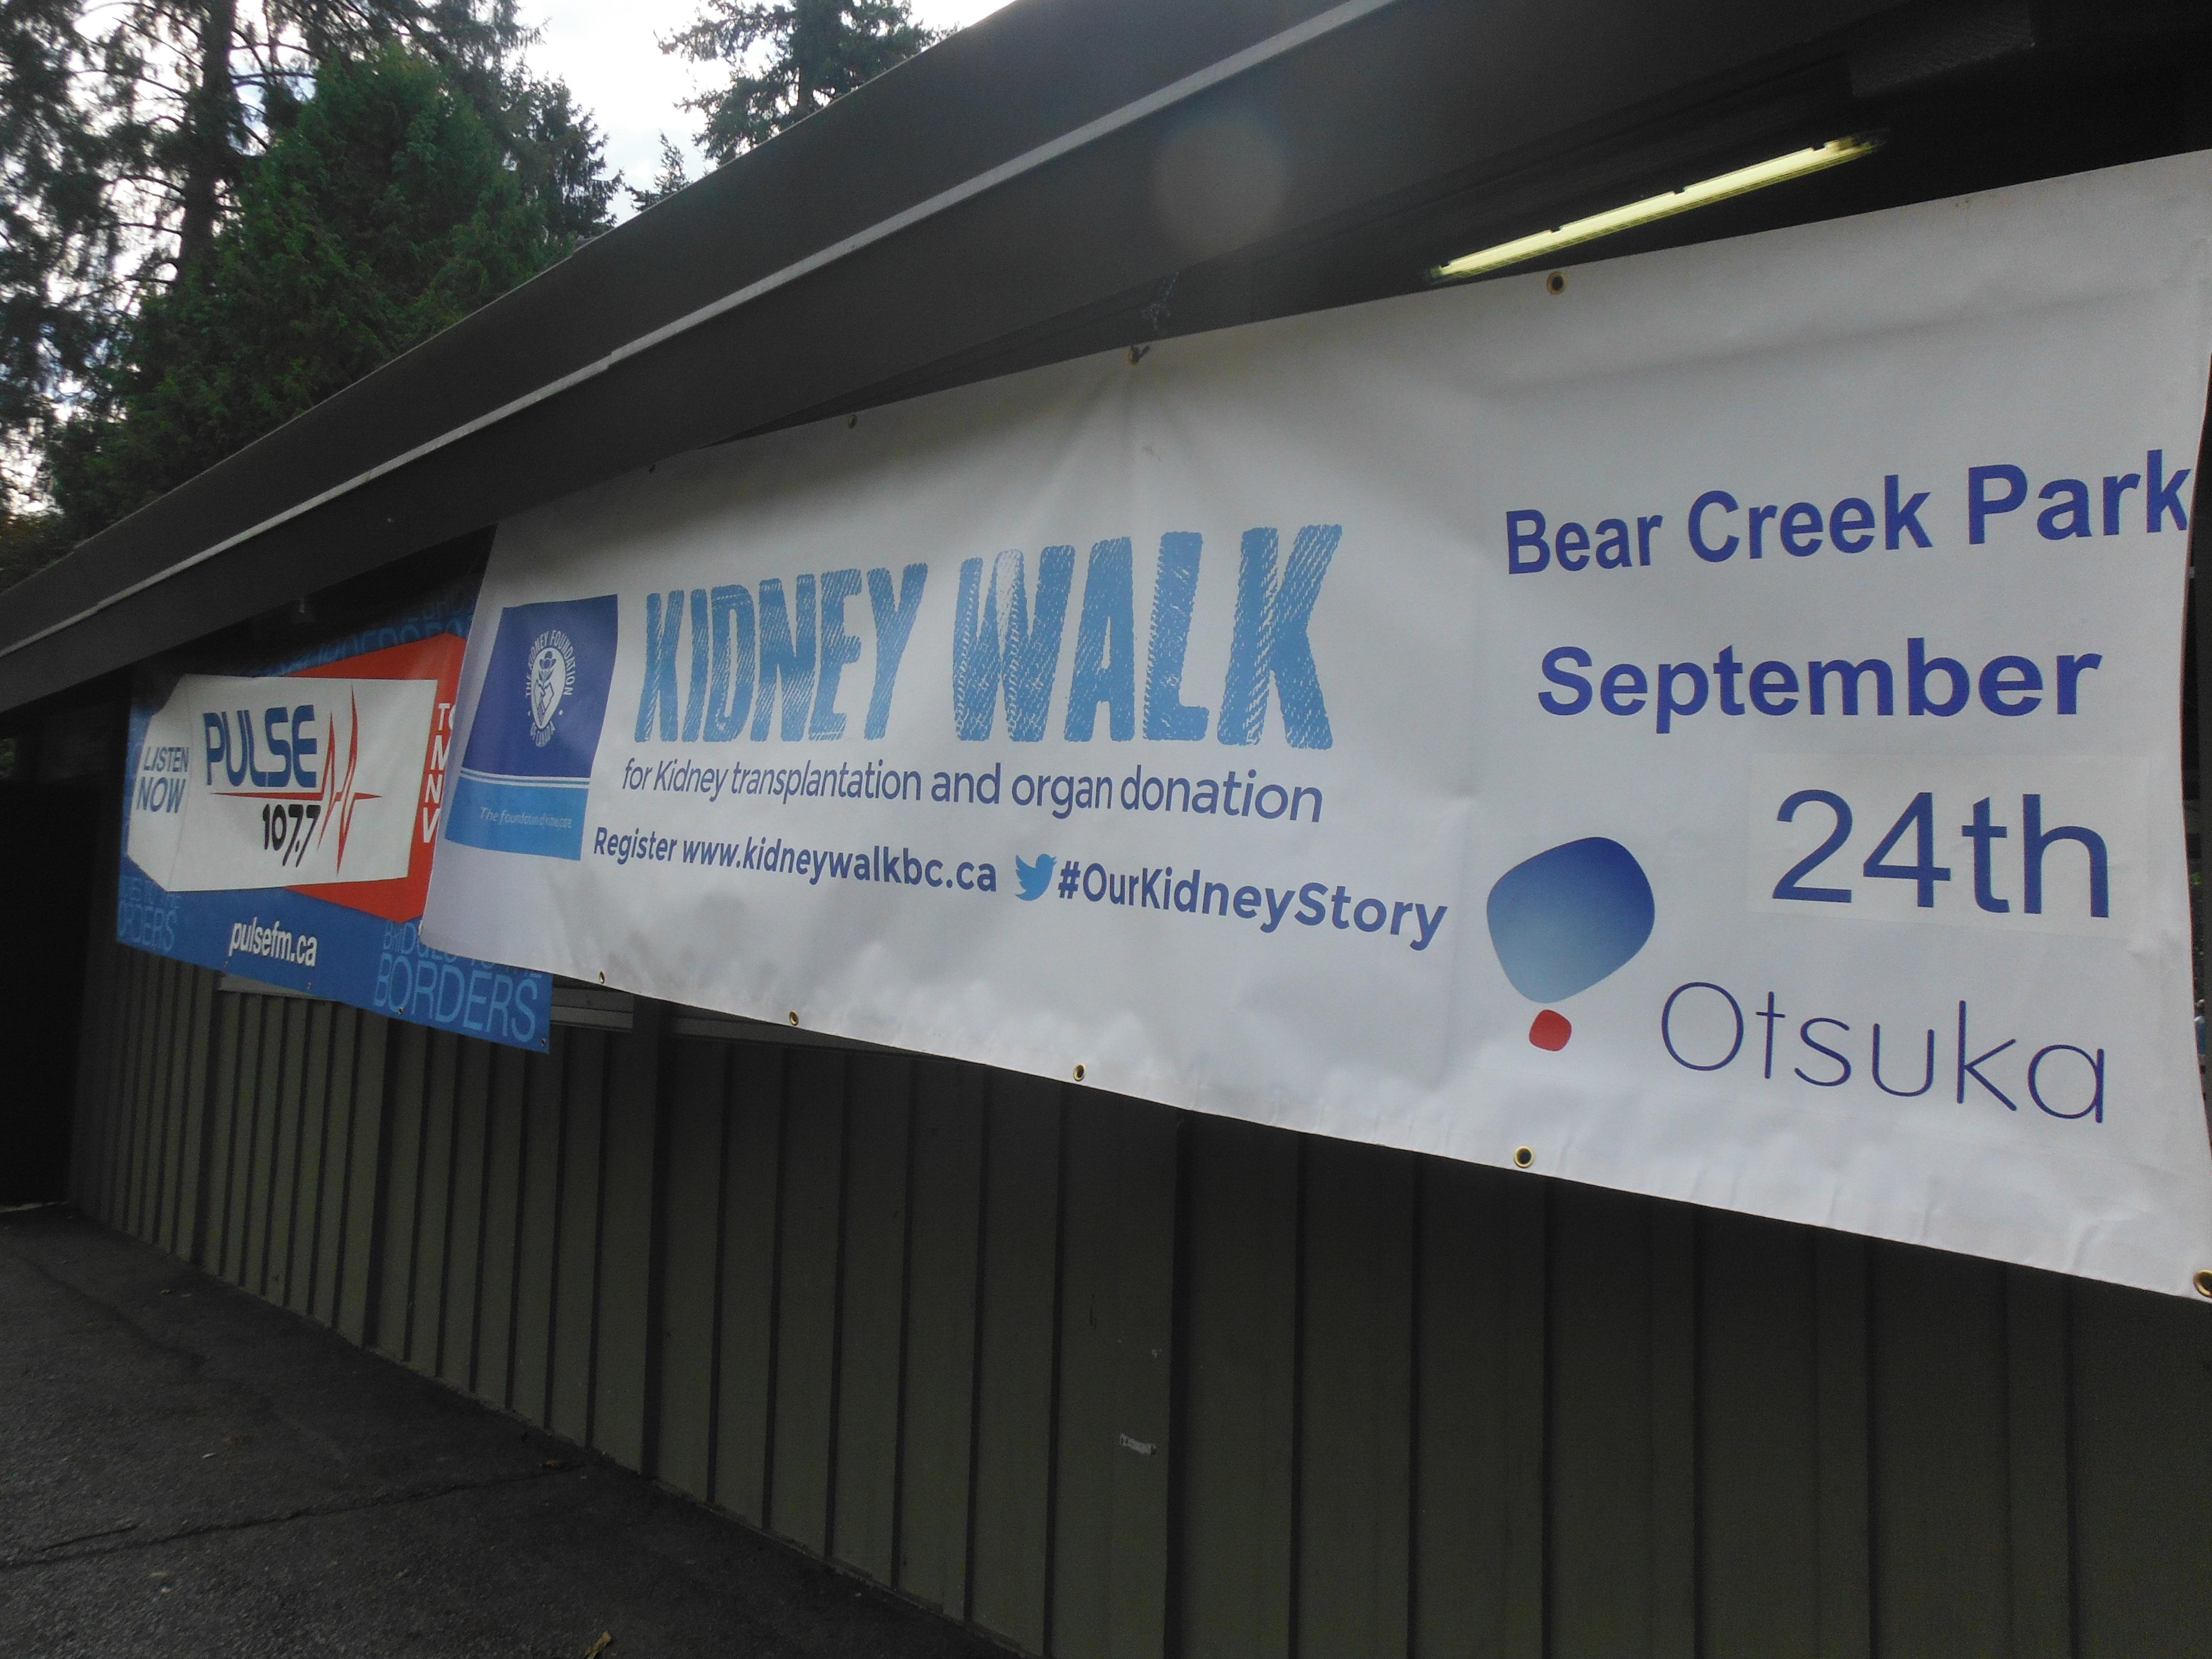 Pulse FM at The Fraser Valley KIDNEY WALK 2017 at Bear Creek Park